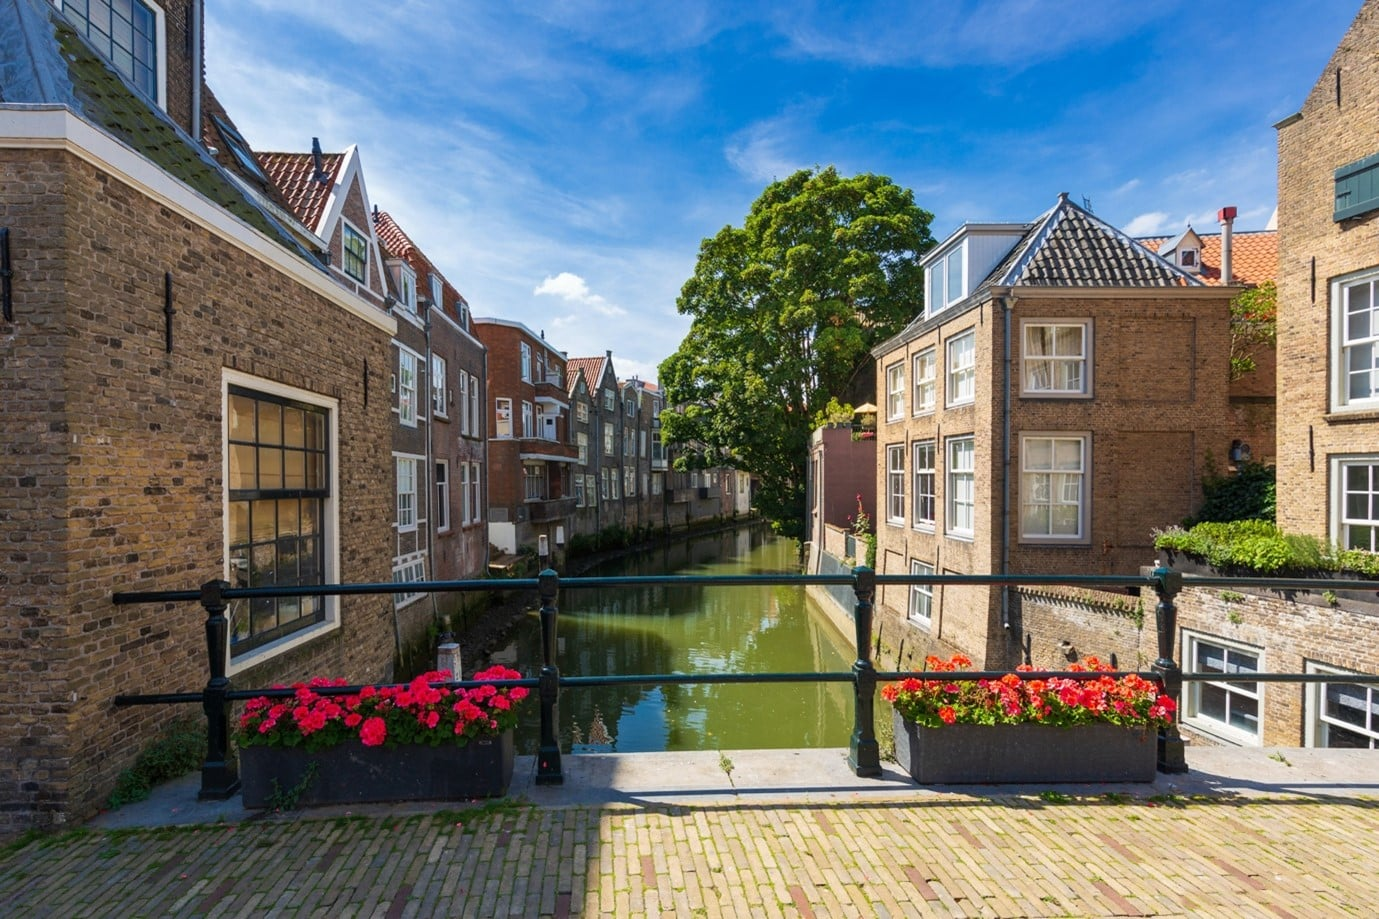 15 Best Alternative European Destinations to Avoid the Crowds